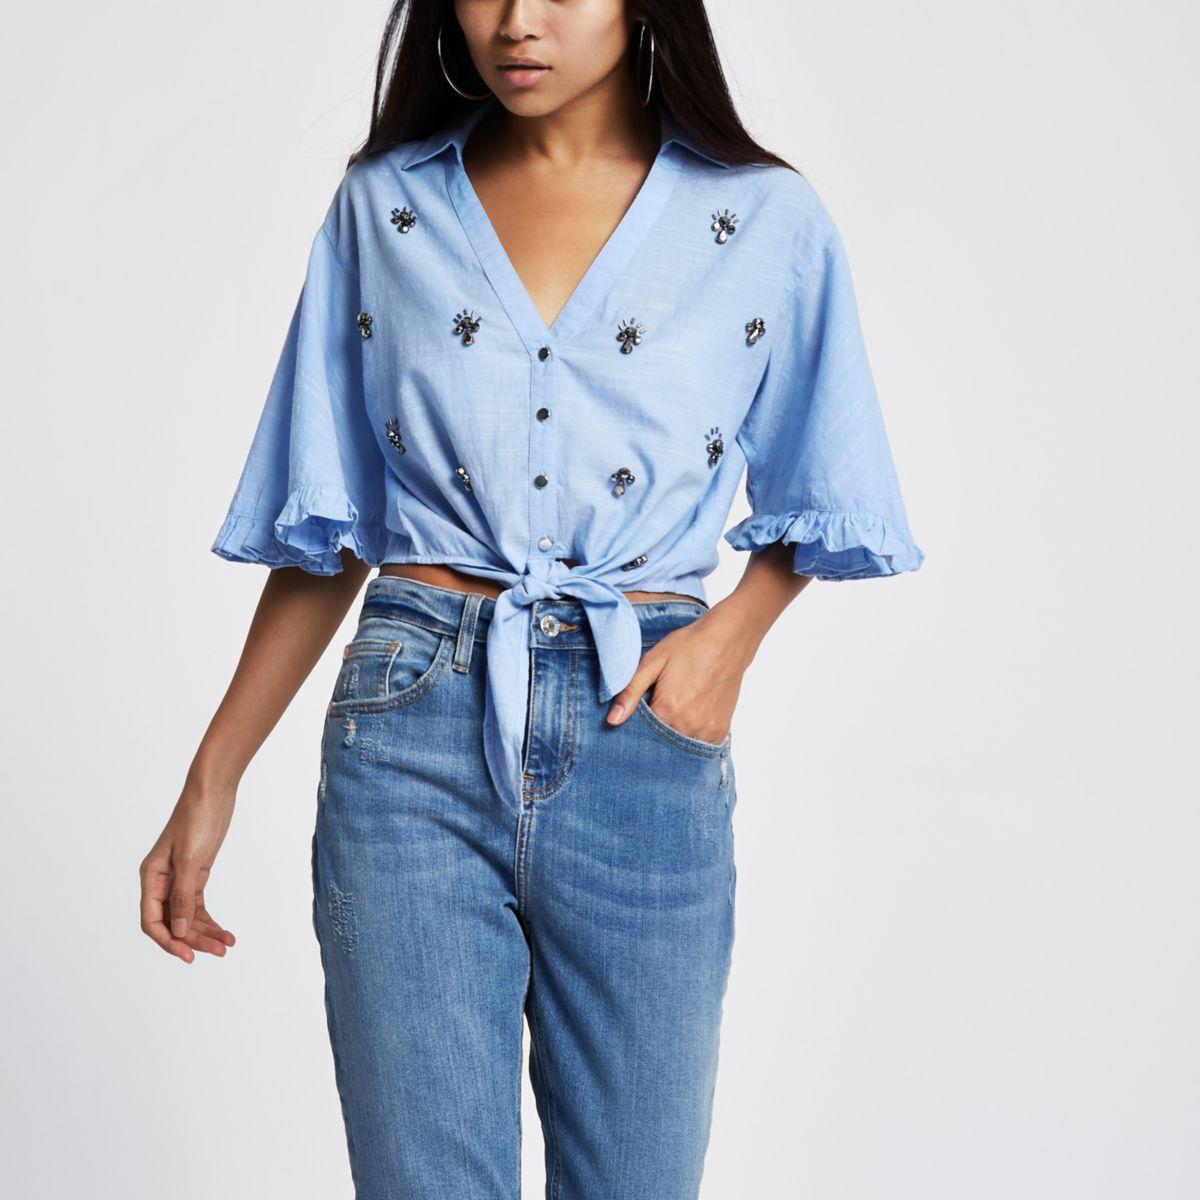 Petite blue jewel embroidered crop top